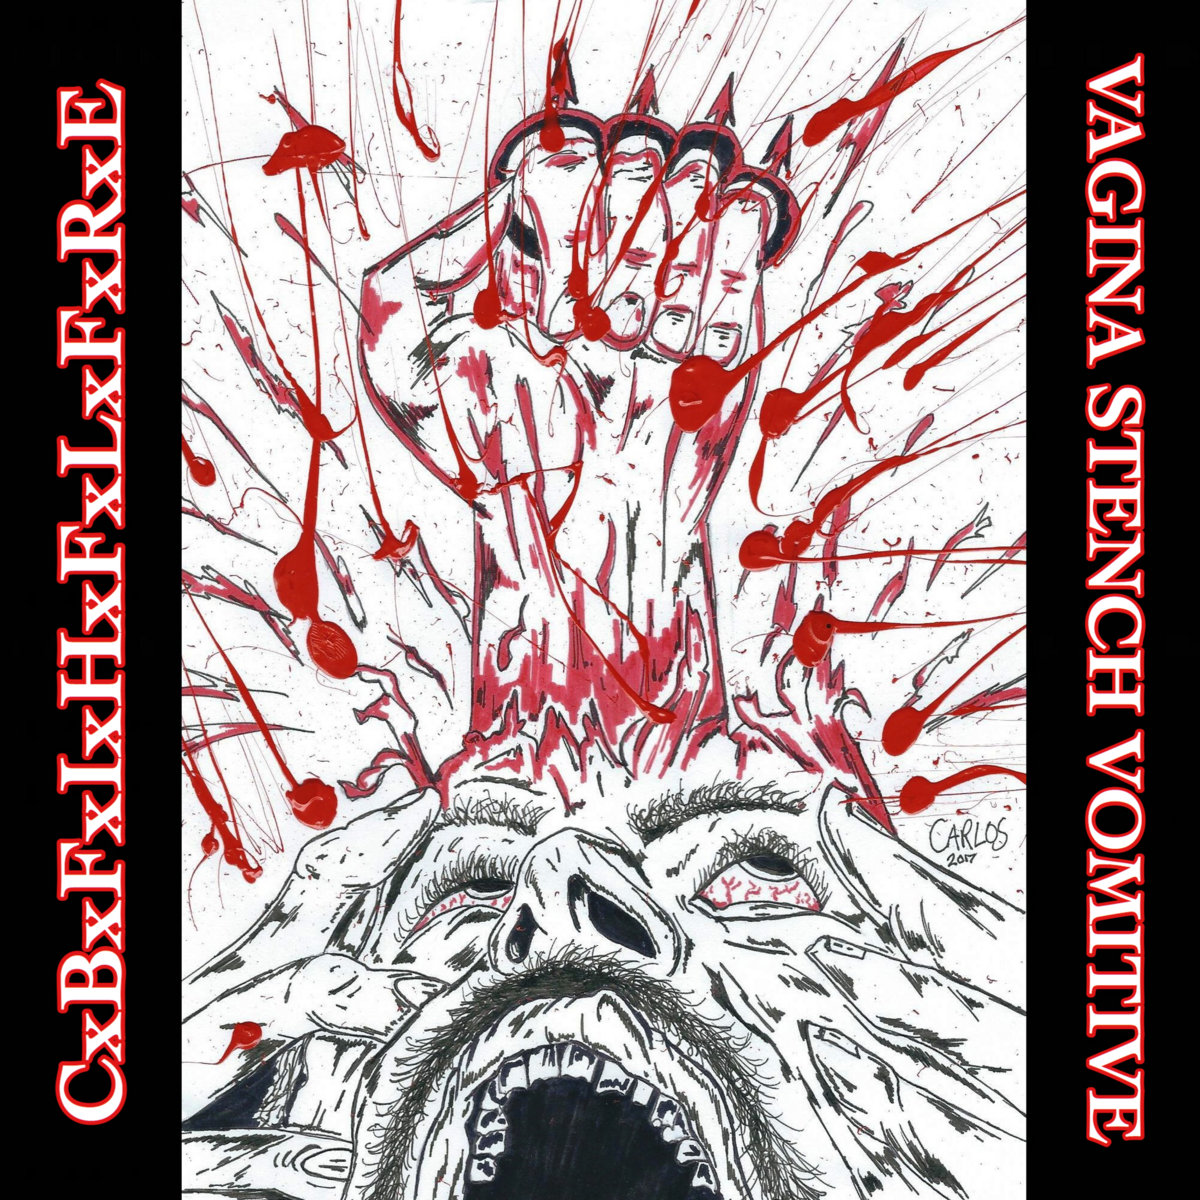 from CxBxFxIxHxFxLxFxRxE Vs VAGINA STENCH VOMITIVE Split by Headgrinder  Records